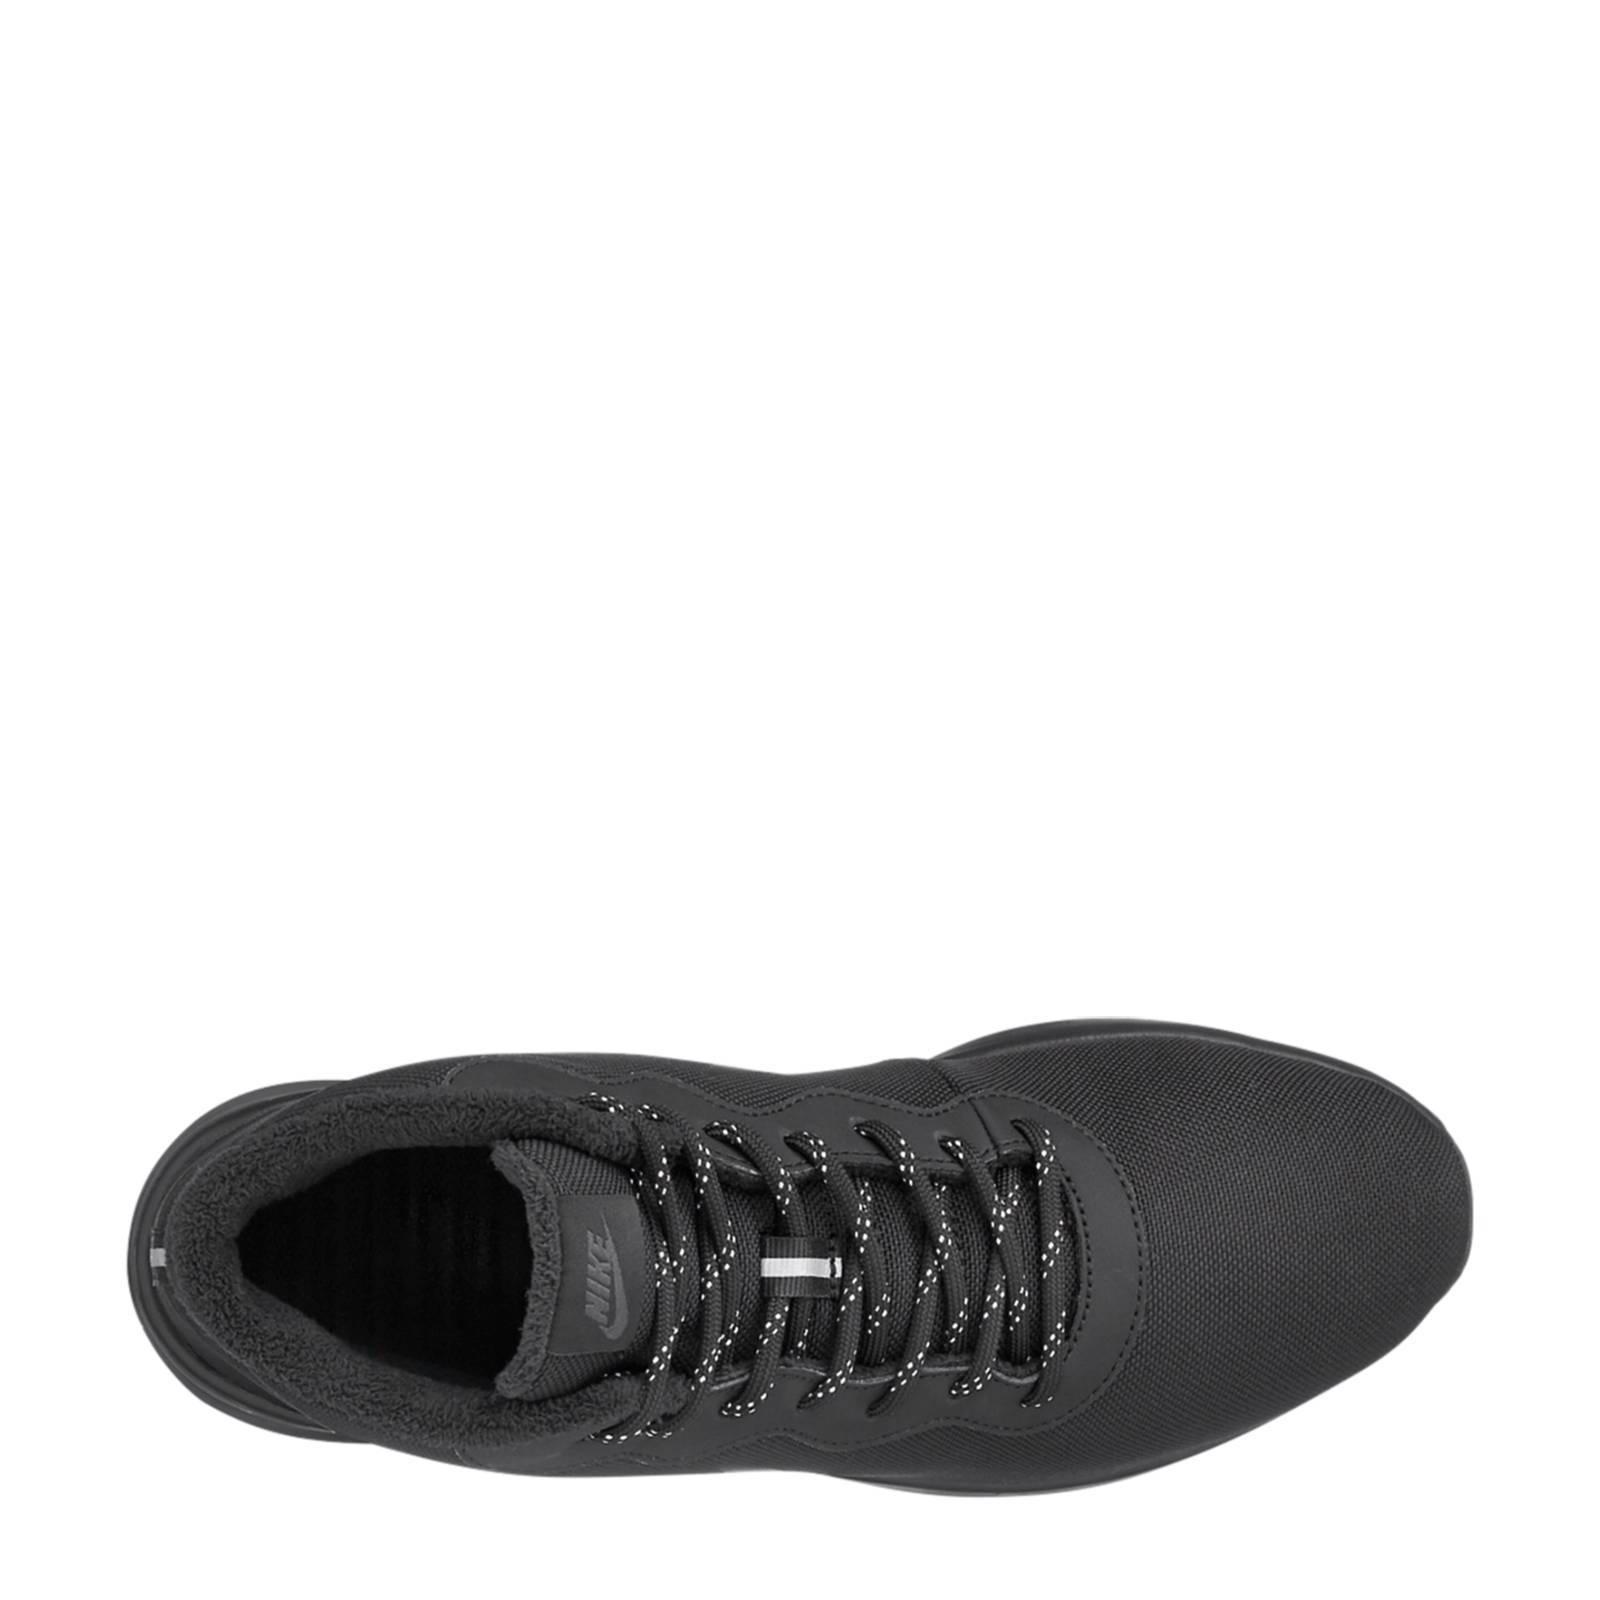 official photos 67f5e b1518 nike-tanjun-chukka-mid-gevoerde-sneakers-zwart.jpg